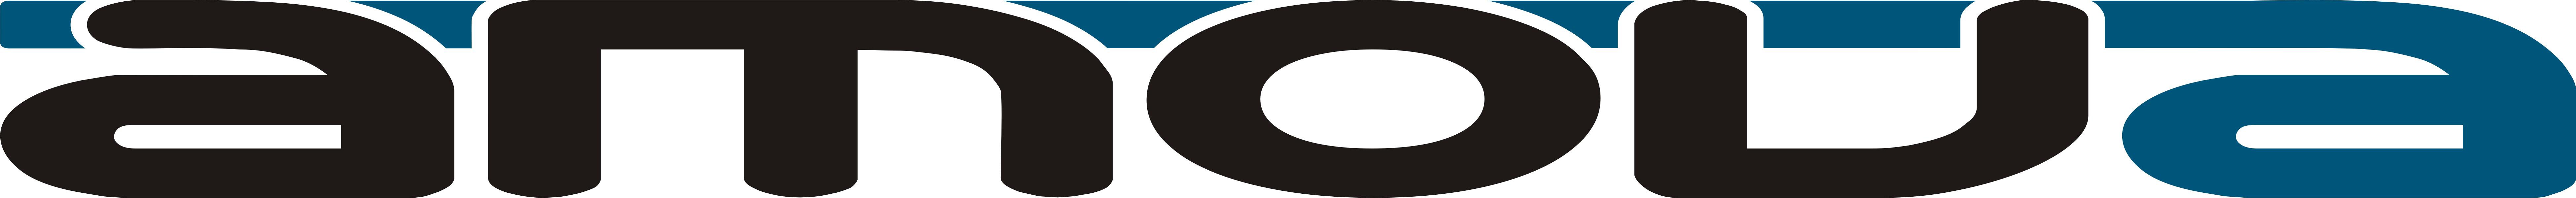 AMOVA-Services GmbH